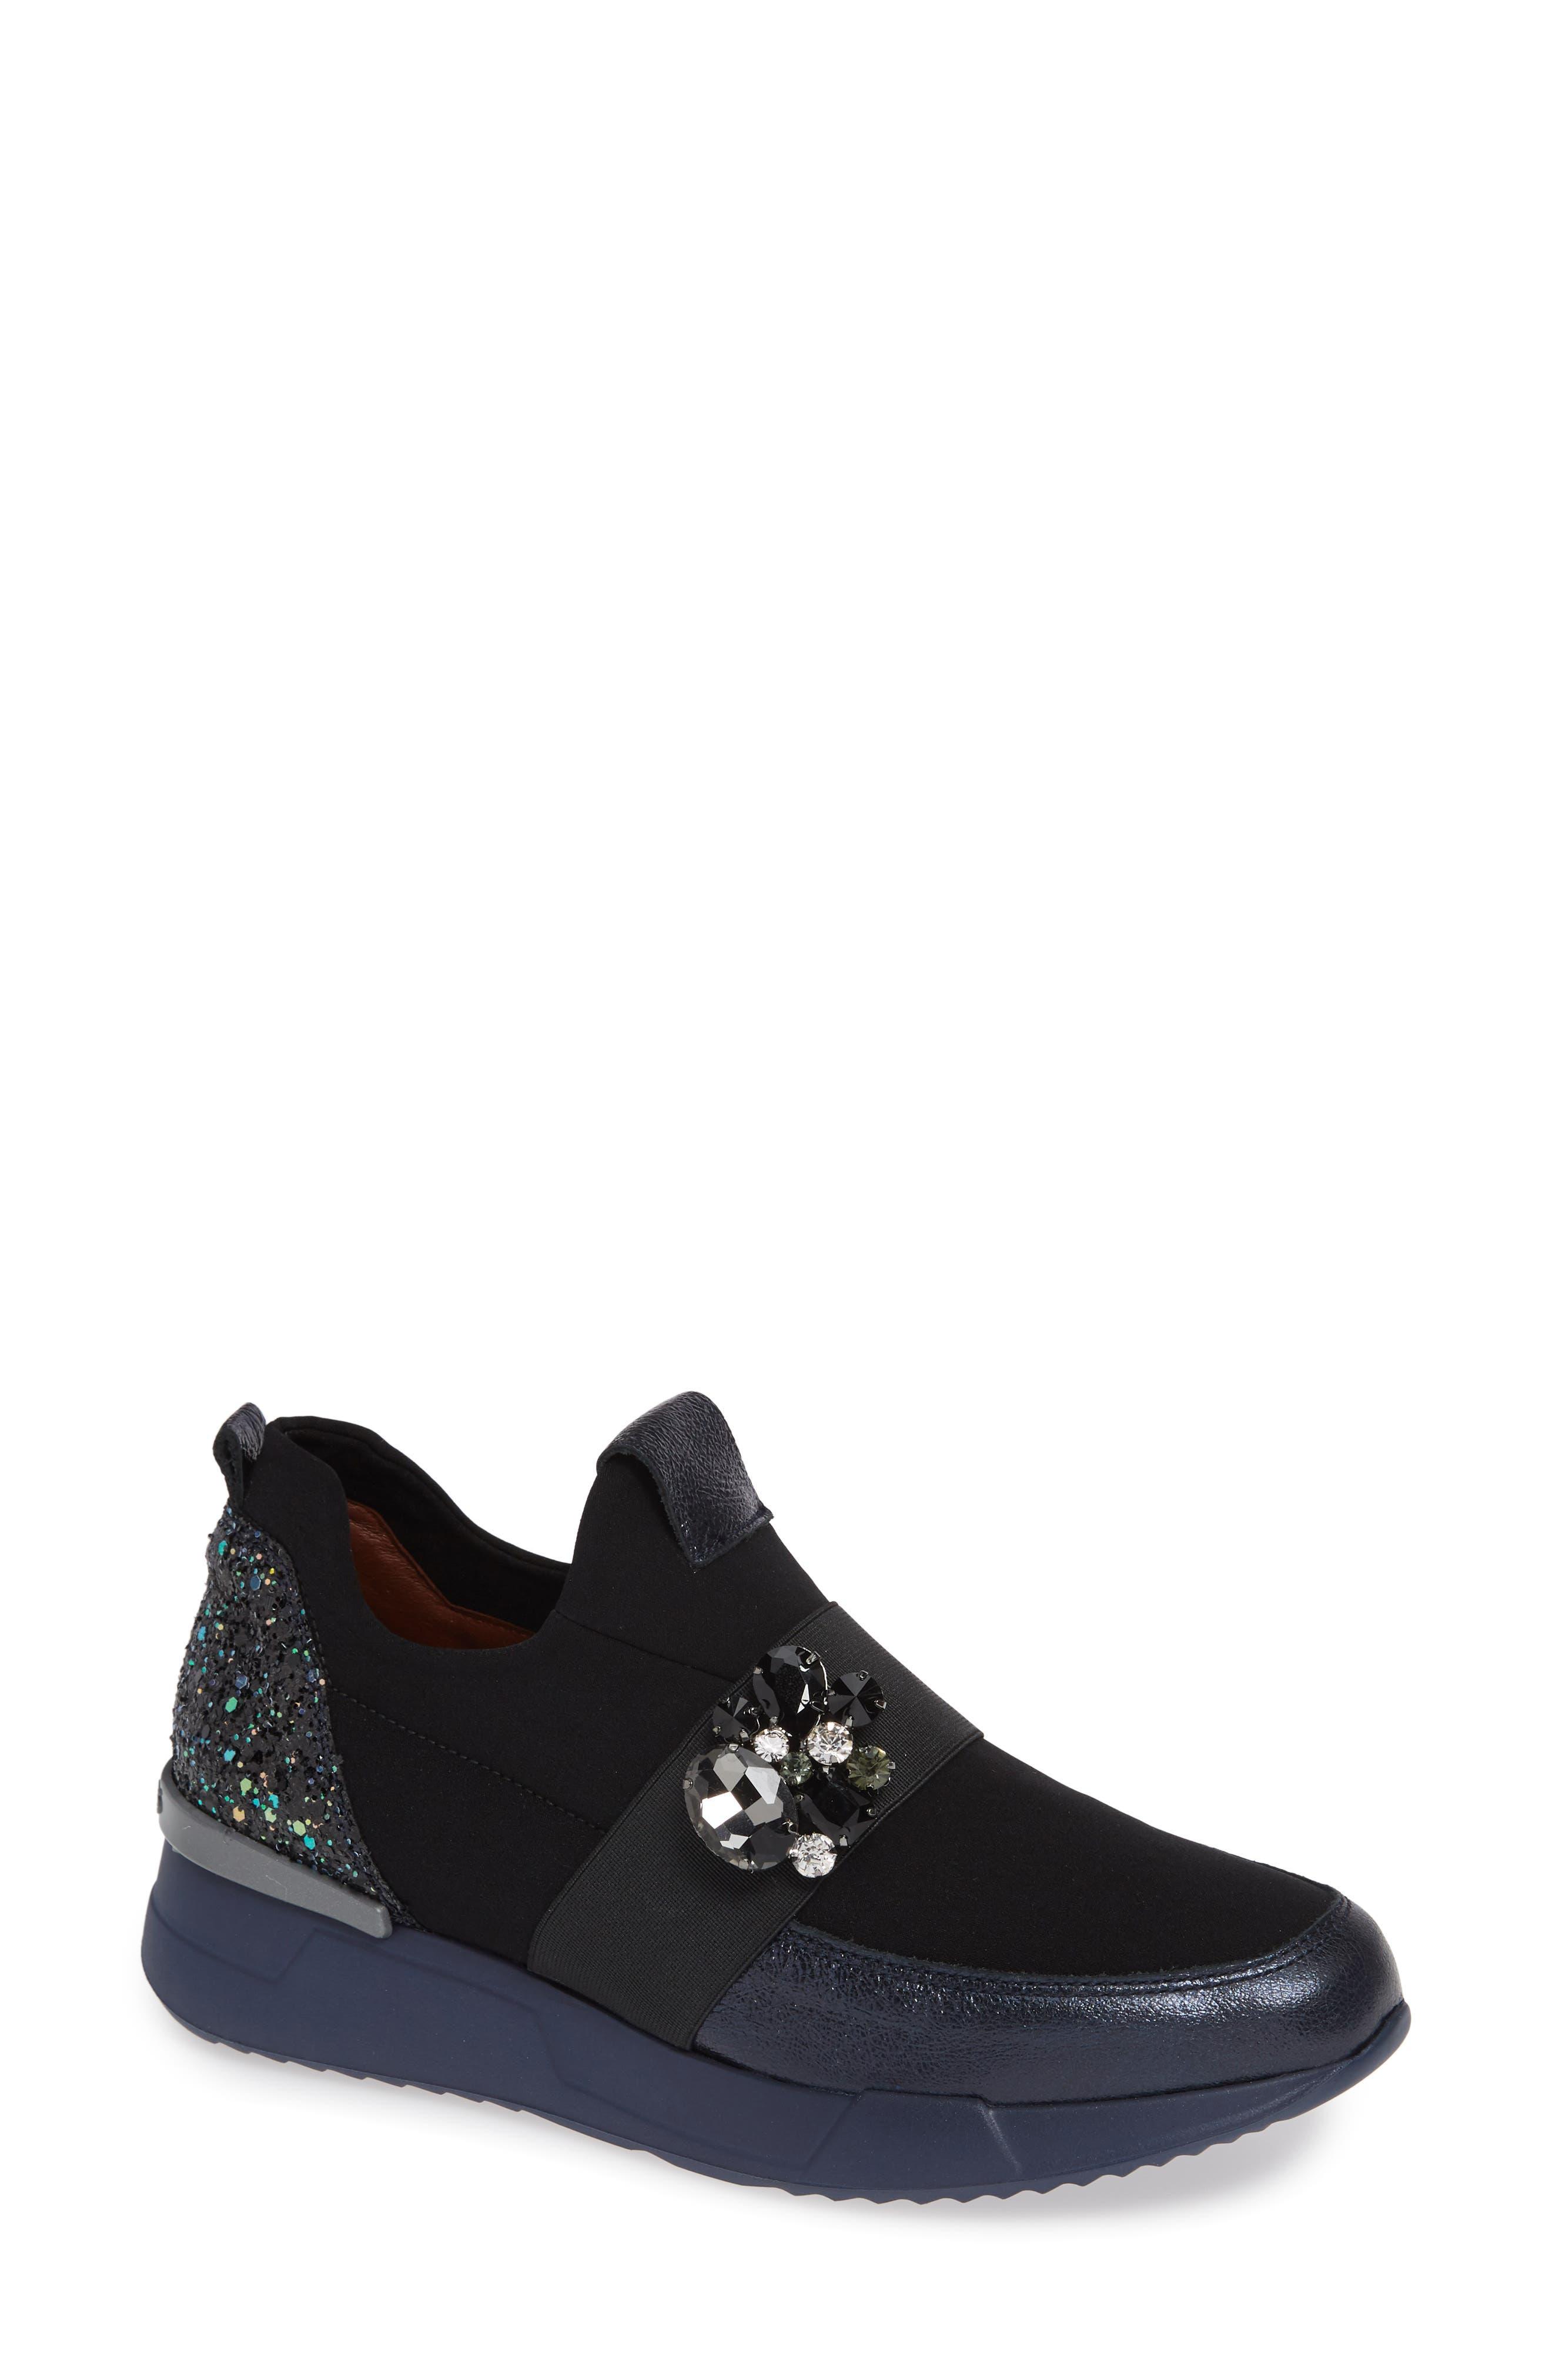 Callen Embellished Sock Sneaker,                         Main,                         color, SHADOW MARINE LEATHER